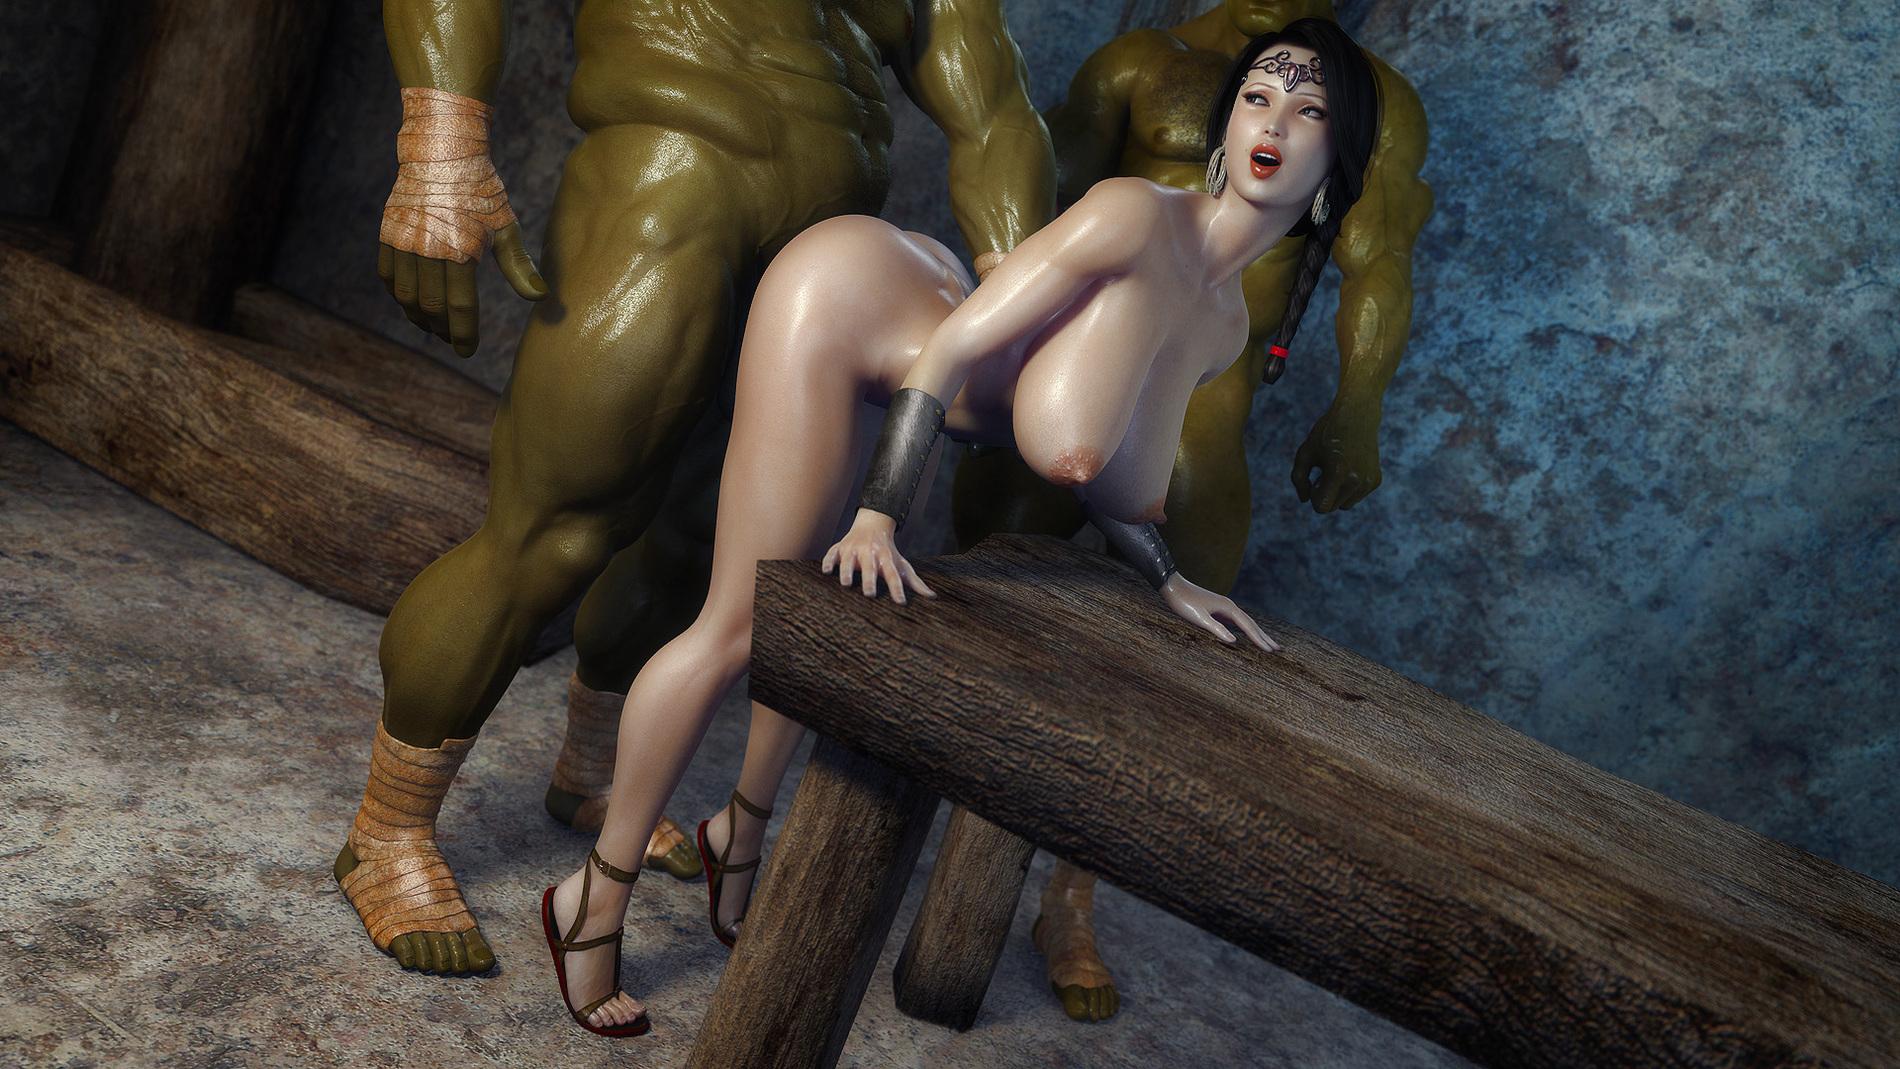 Monster nude pics